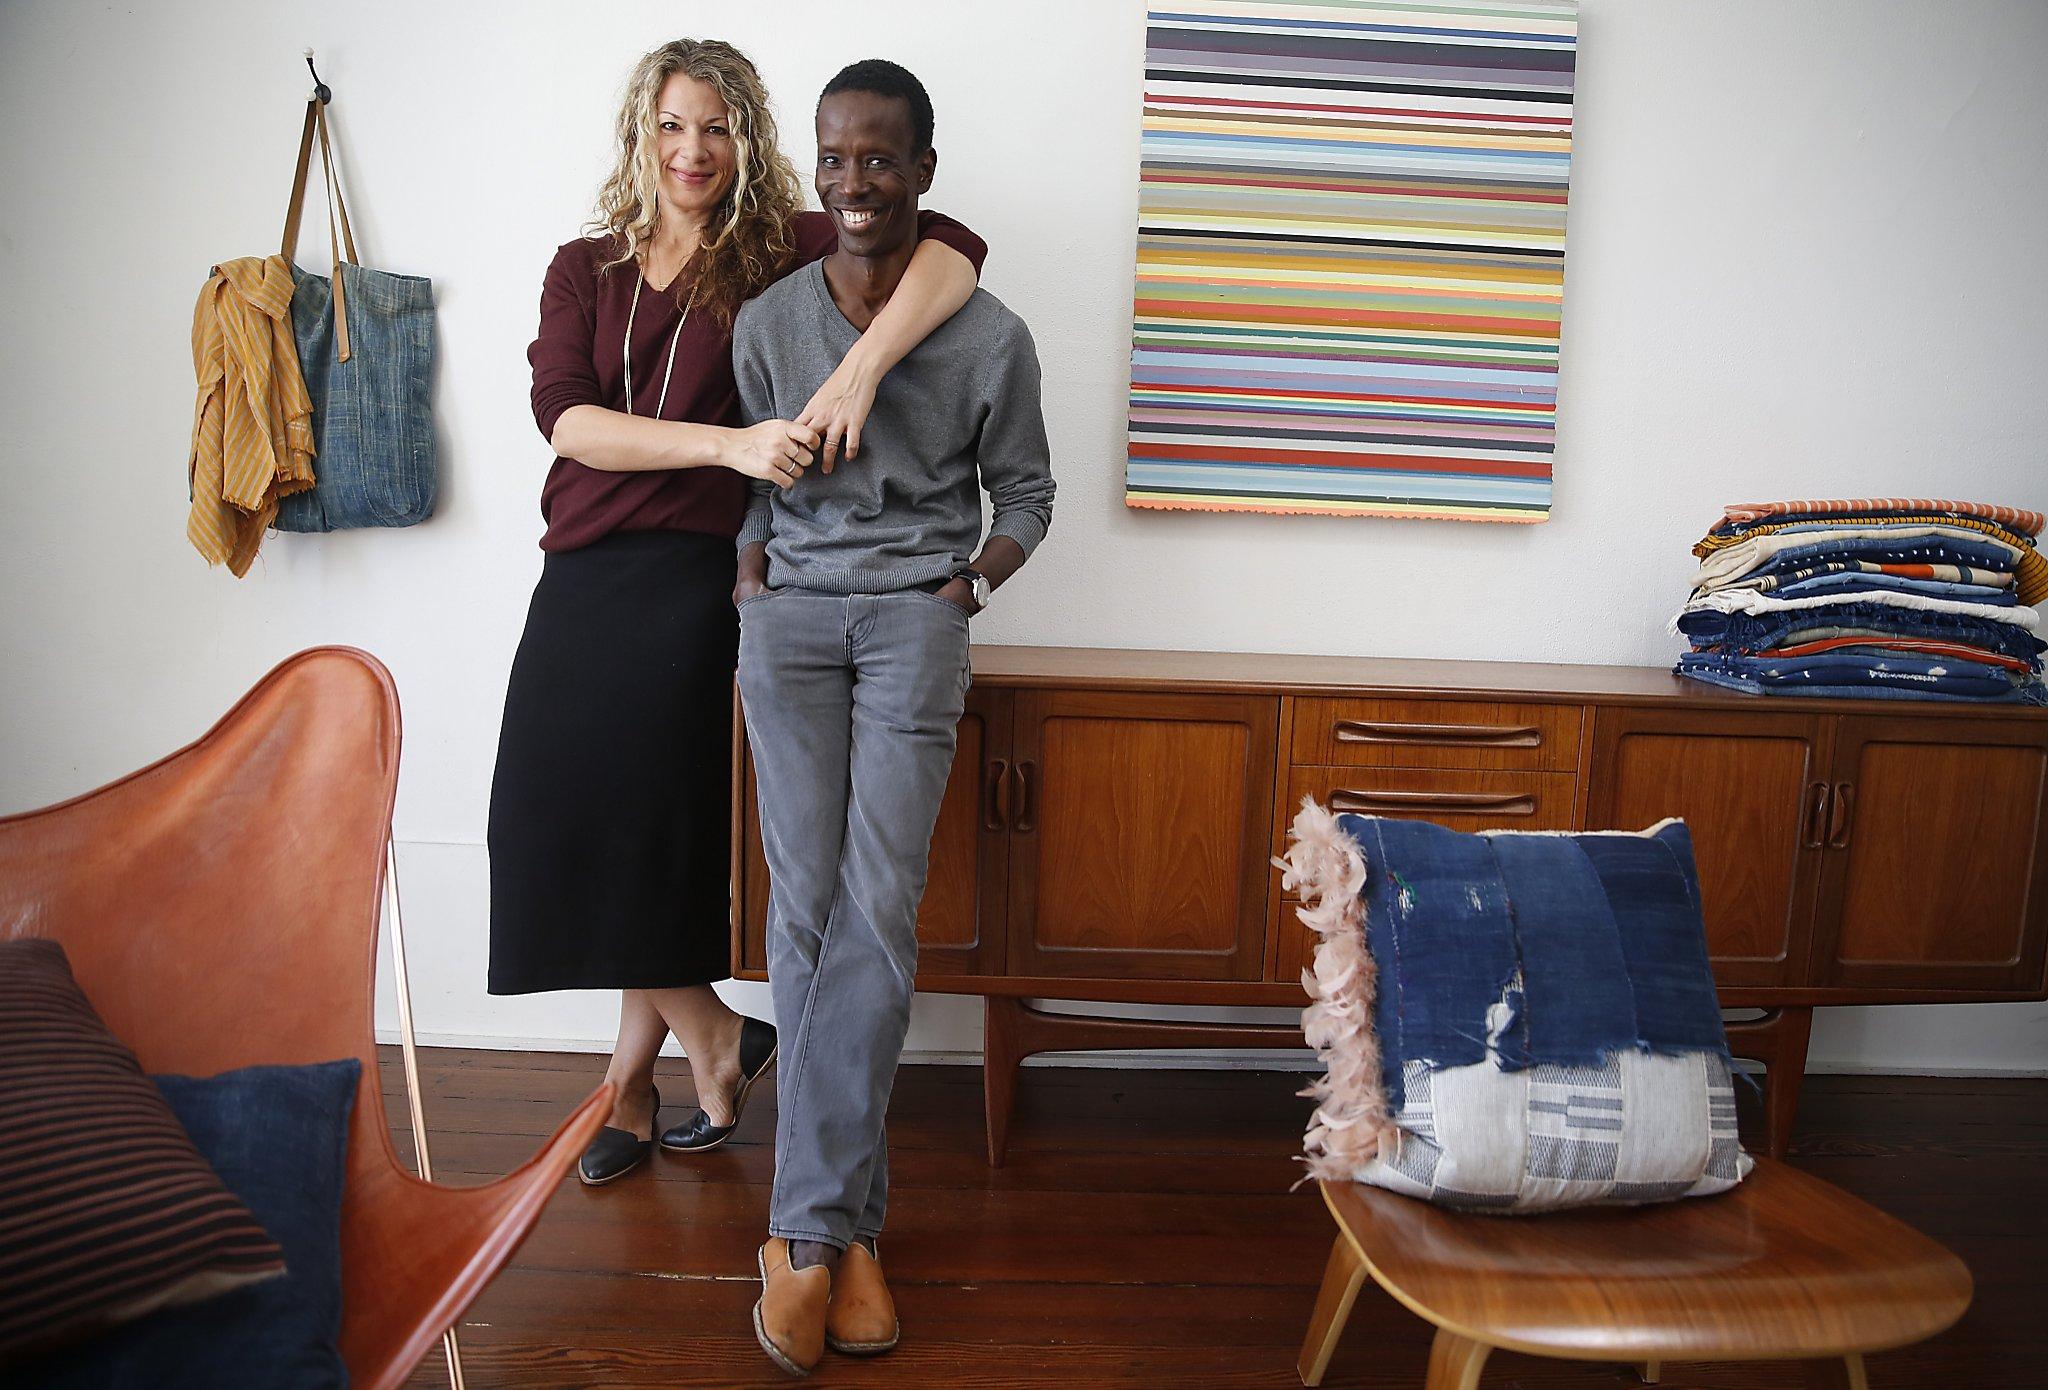 Merveilleux African Textiles Tell Coupleu0027s Story And Artisansu0027 History   SFChronicle.com